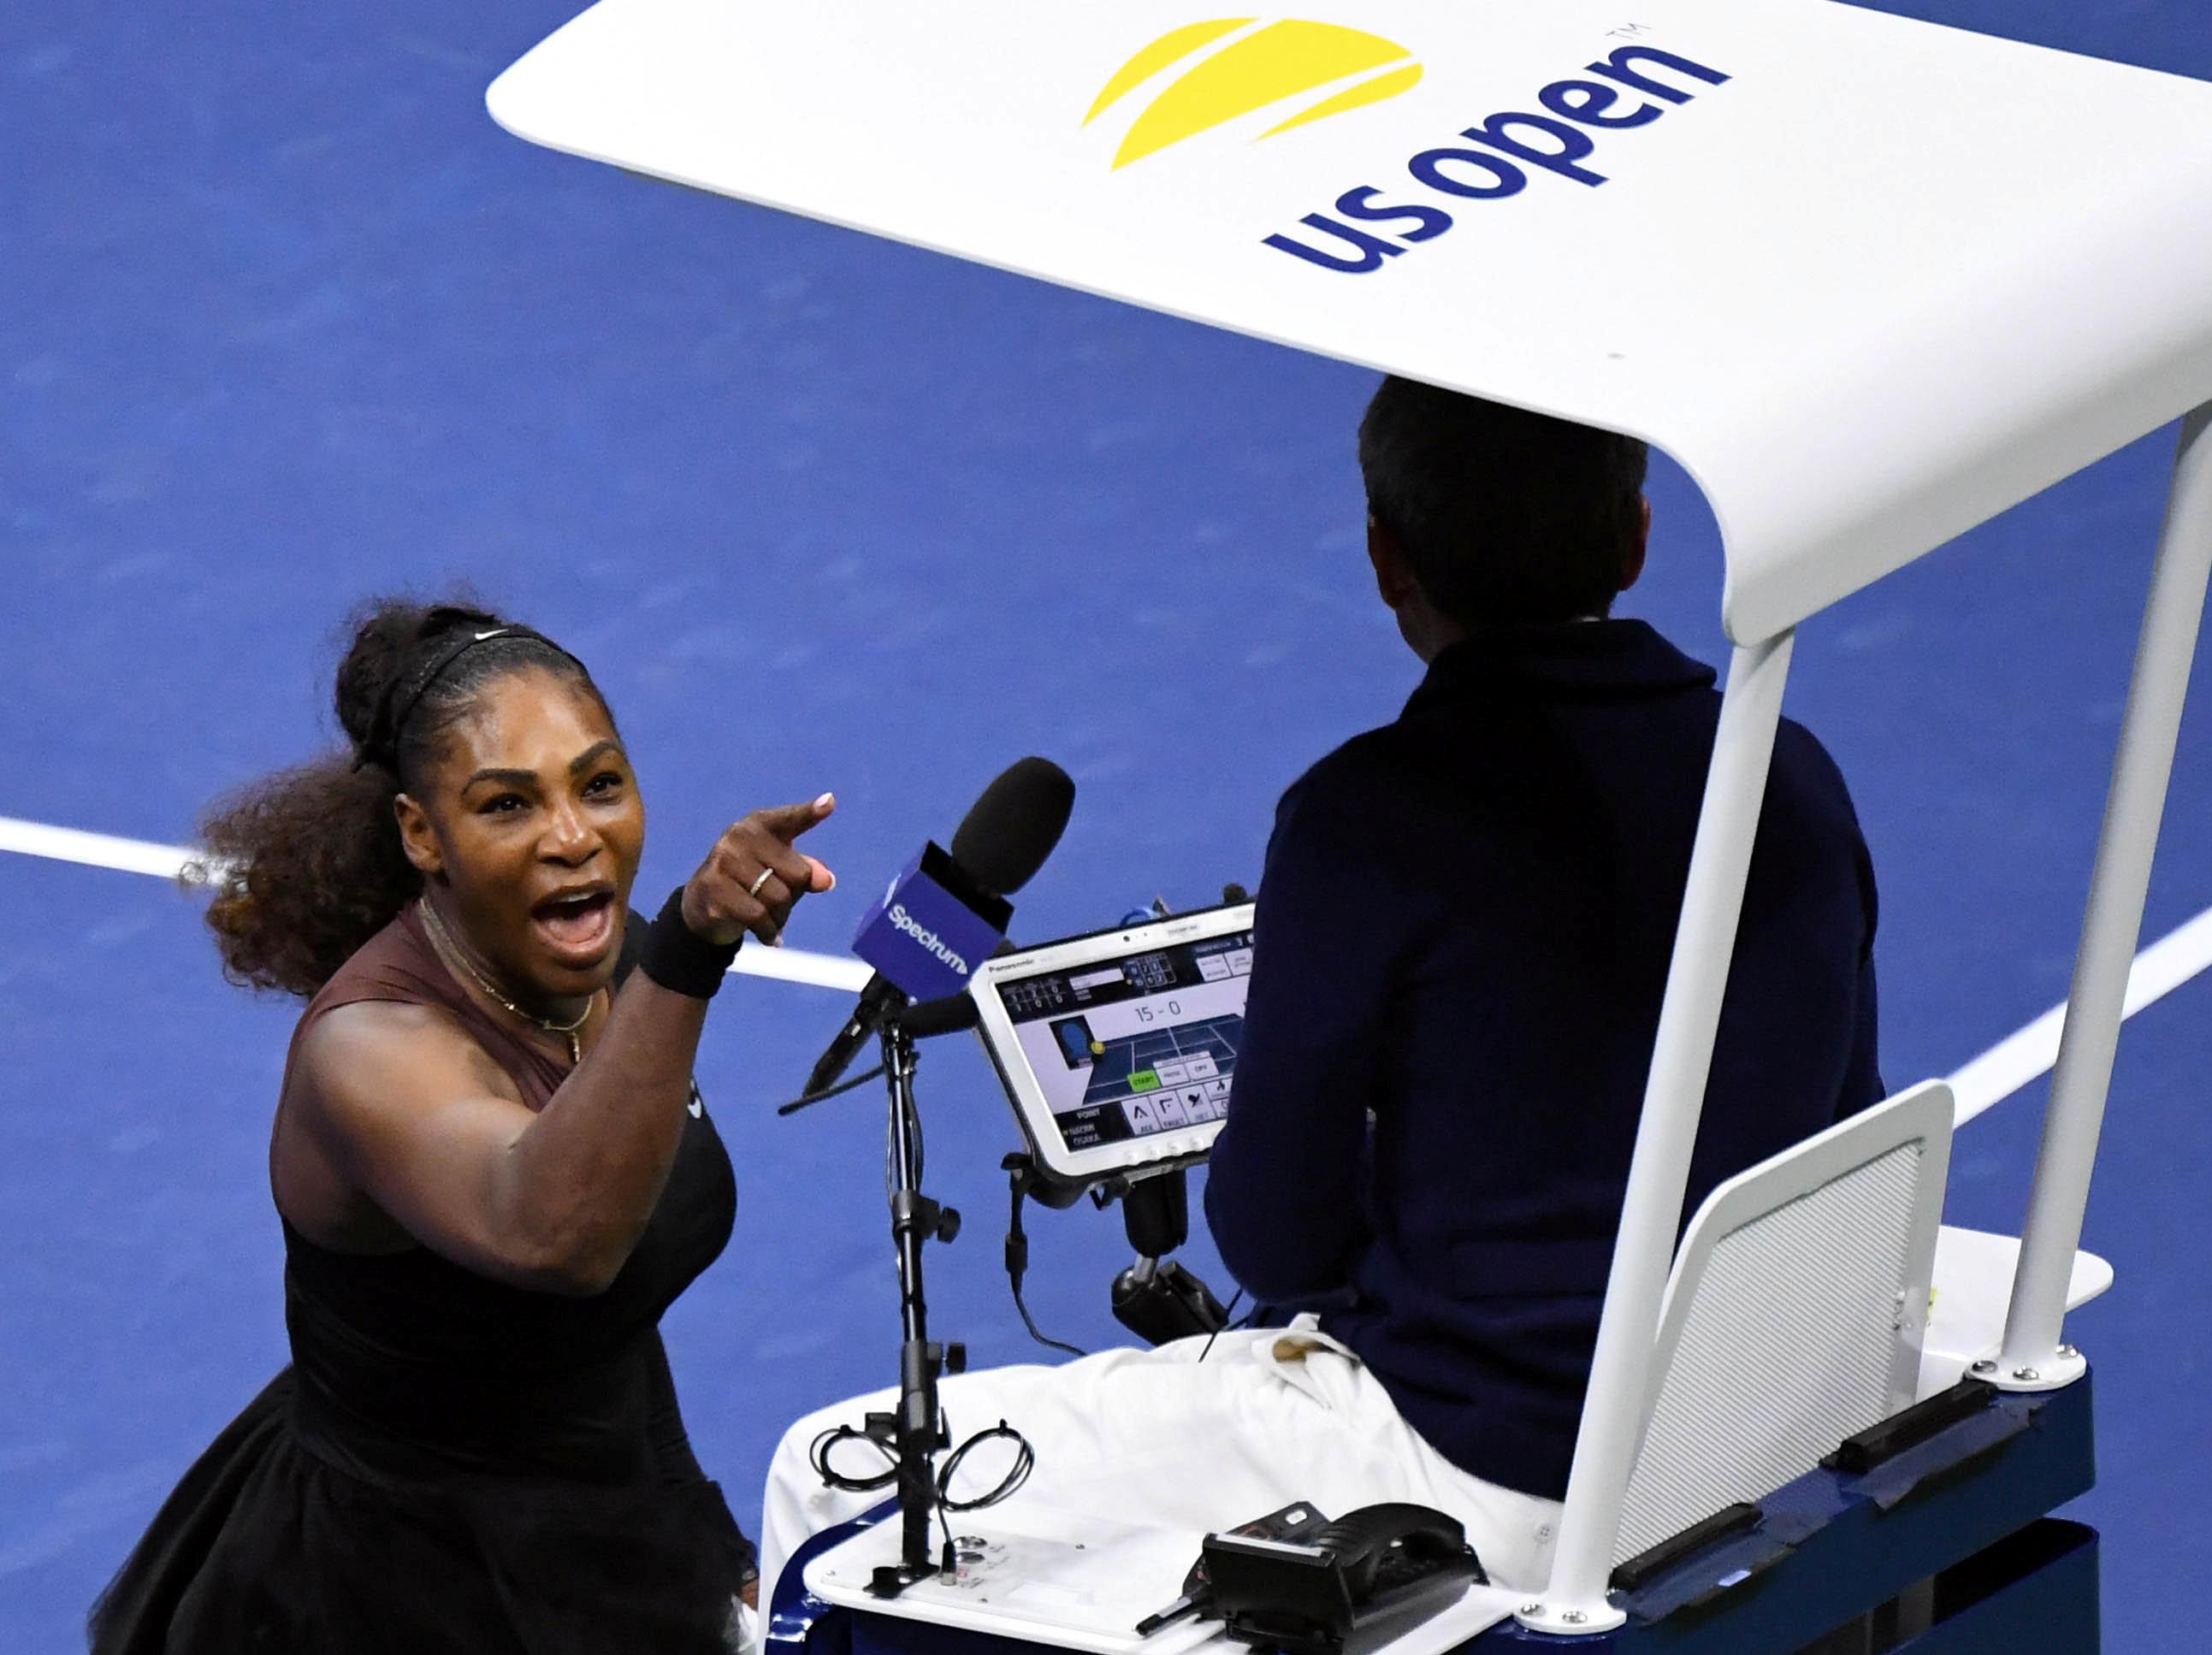 Serena Williams le grita al umpire Carlos Ramos durante la final del US Open(Danielle Parhizkaran-USA TODAY SPORTS)